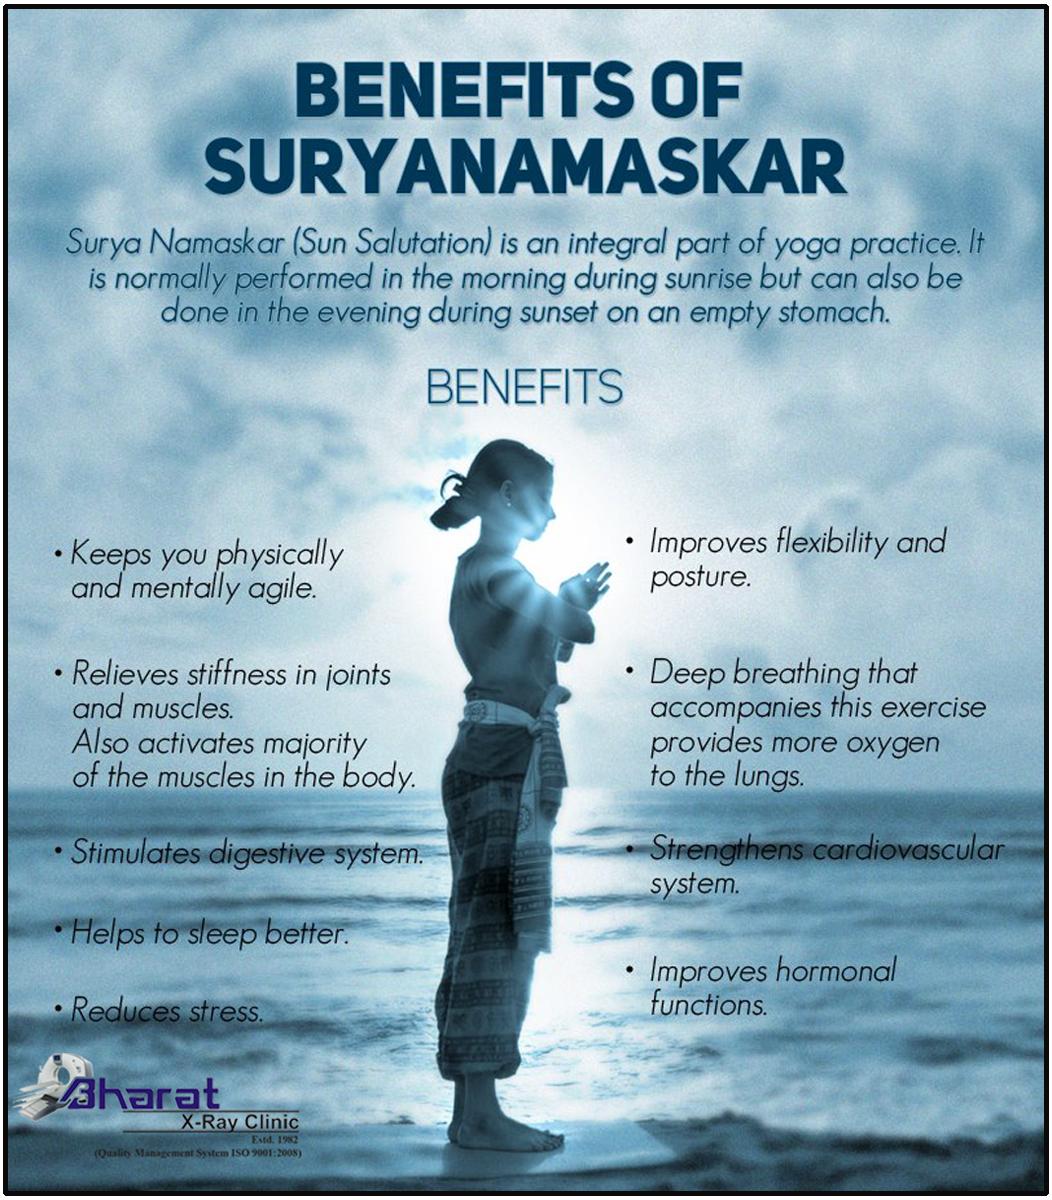 Health Benefits Of Surya Namaskar Suryanamaskar Sun Salutation Bharatxrayclinic Surya Namaskar Yoga Benefits Meditation Benefits